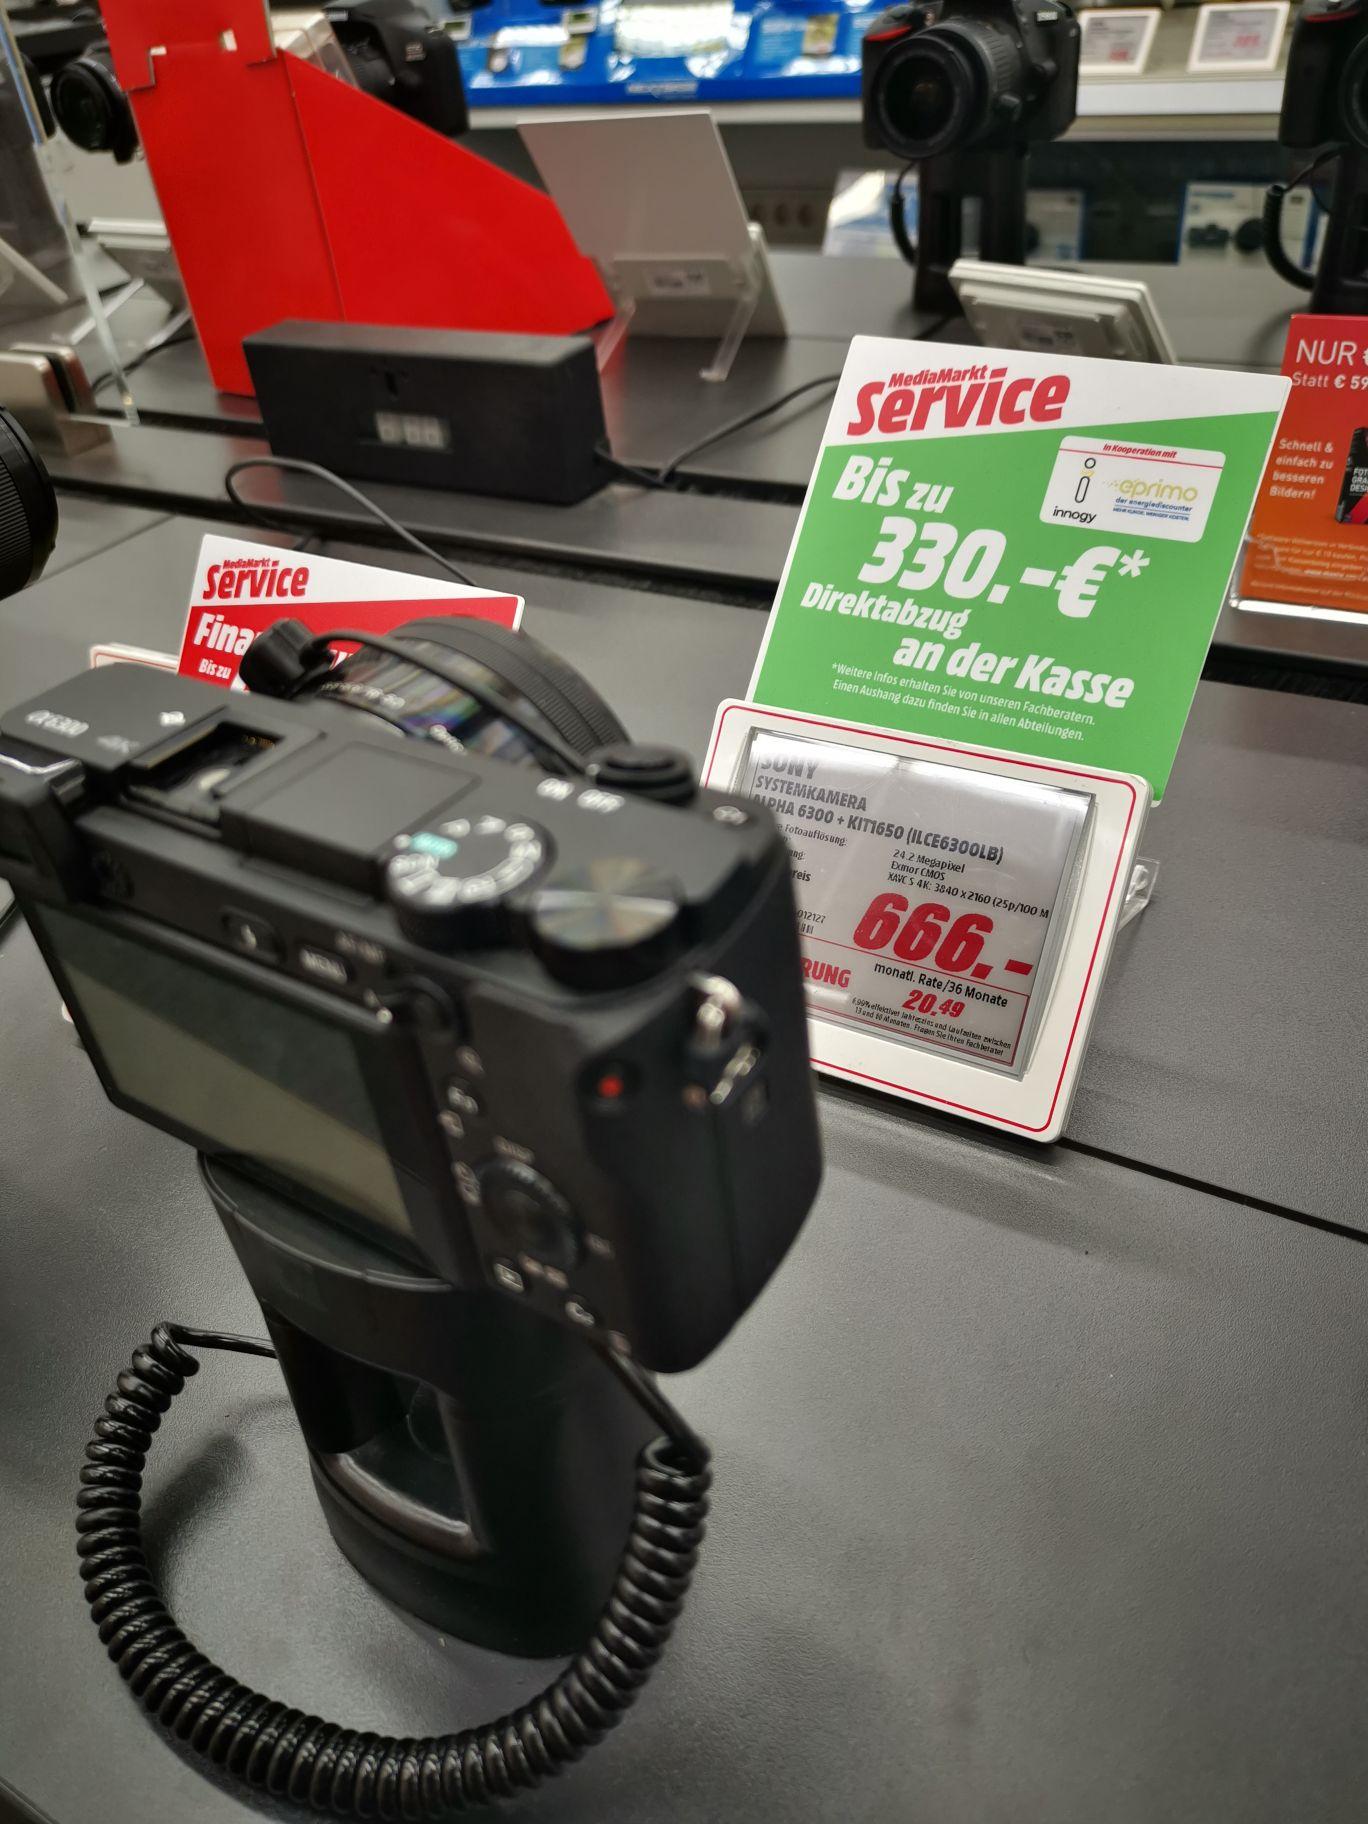 Sony Alpha 6300 Kit LOKAL Mülheim an der Ruhr